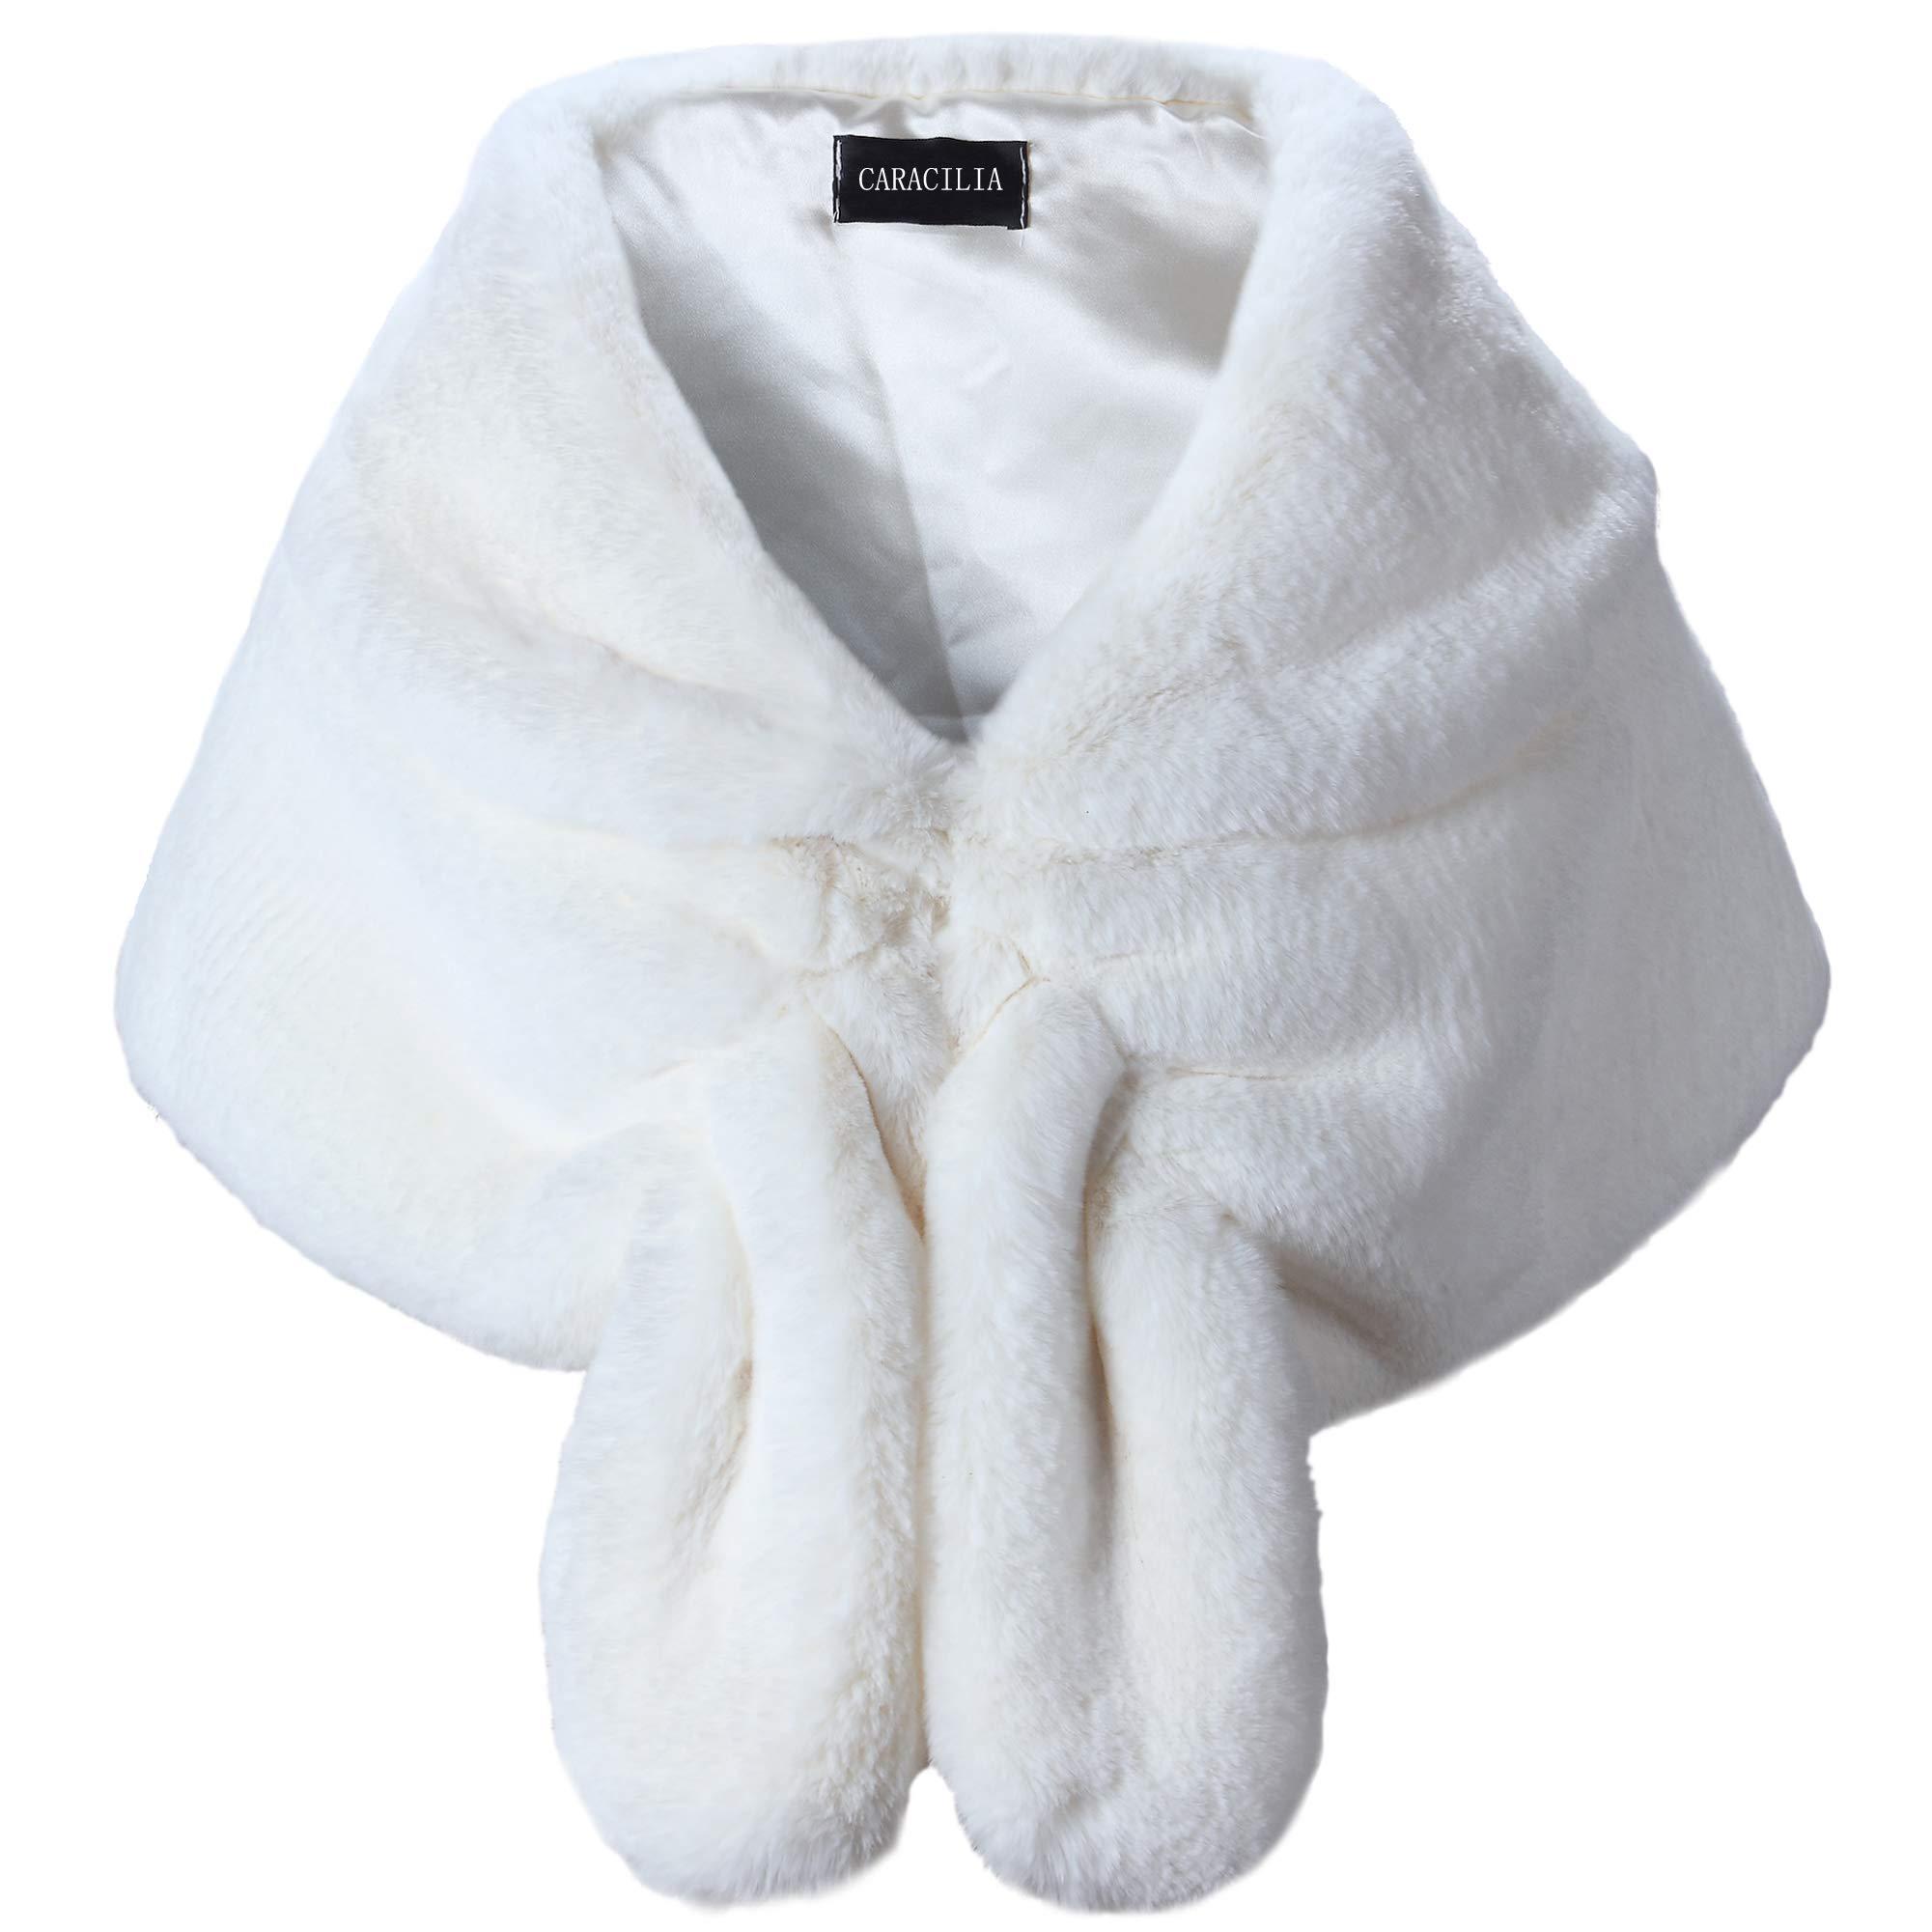 Caracilia Women Wedding Bridal Faux Fur Shawls and Wraps CA95 , Ivory2 , Large